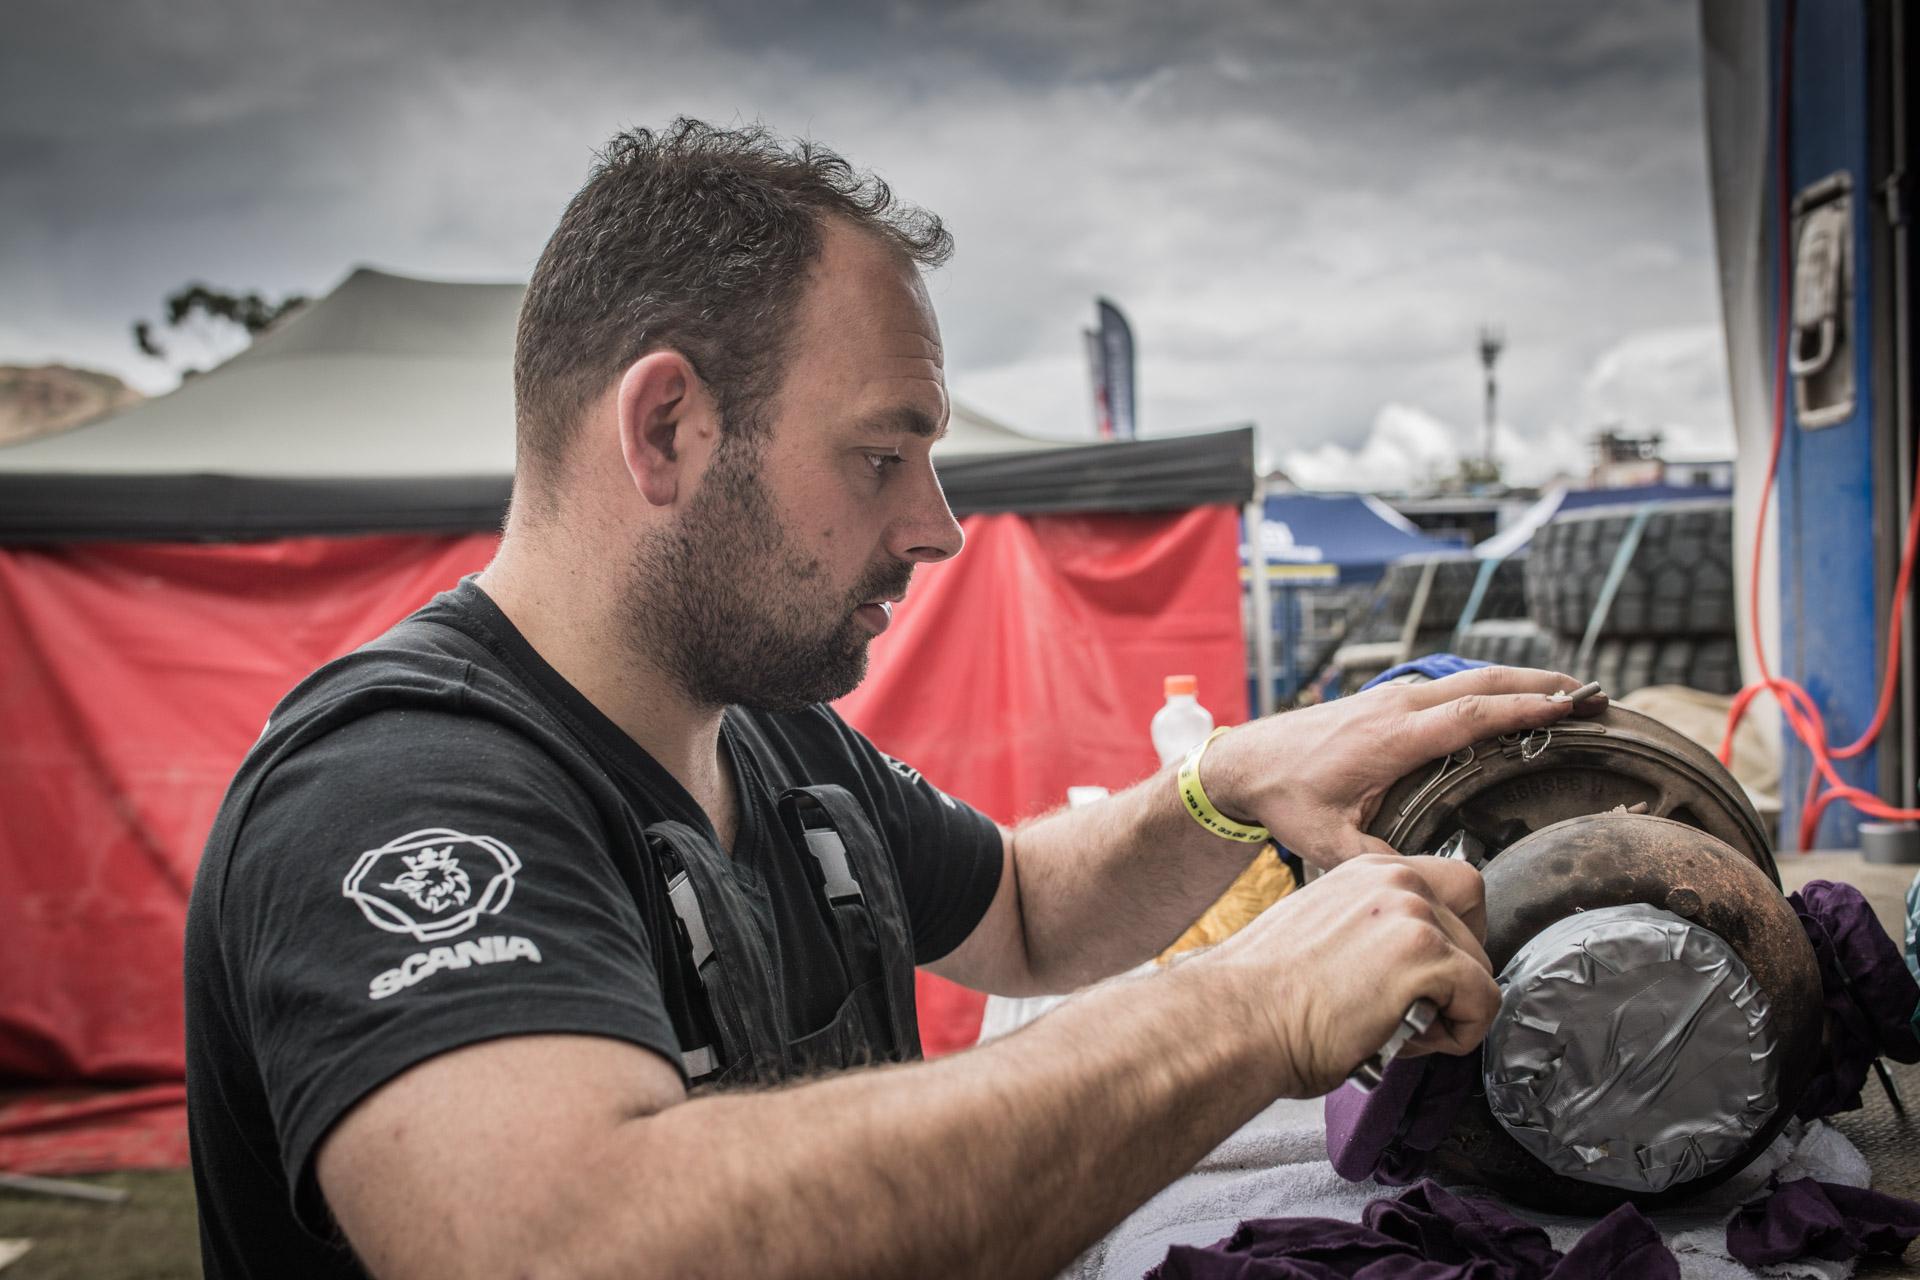 Dakarspeed: Etappe 7 La Paz - Uyuni